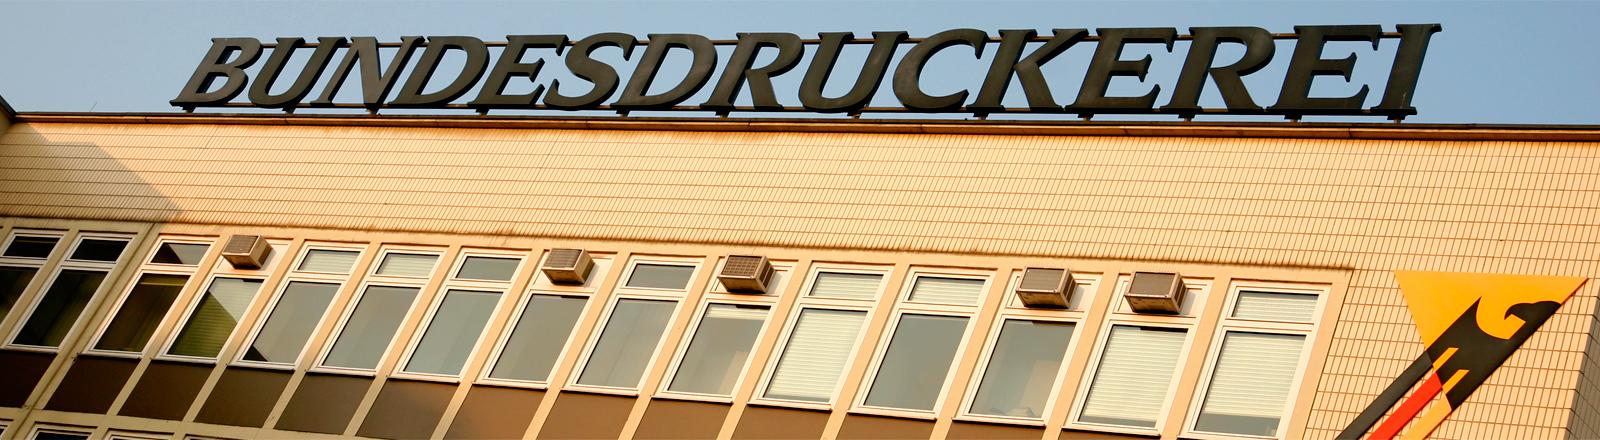 Das Gebäude der Bundesdruckerei in Berlin-Kreuzberg.